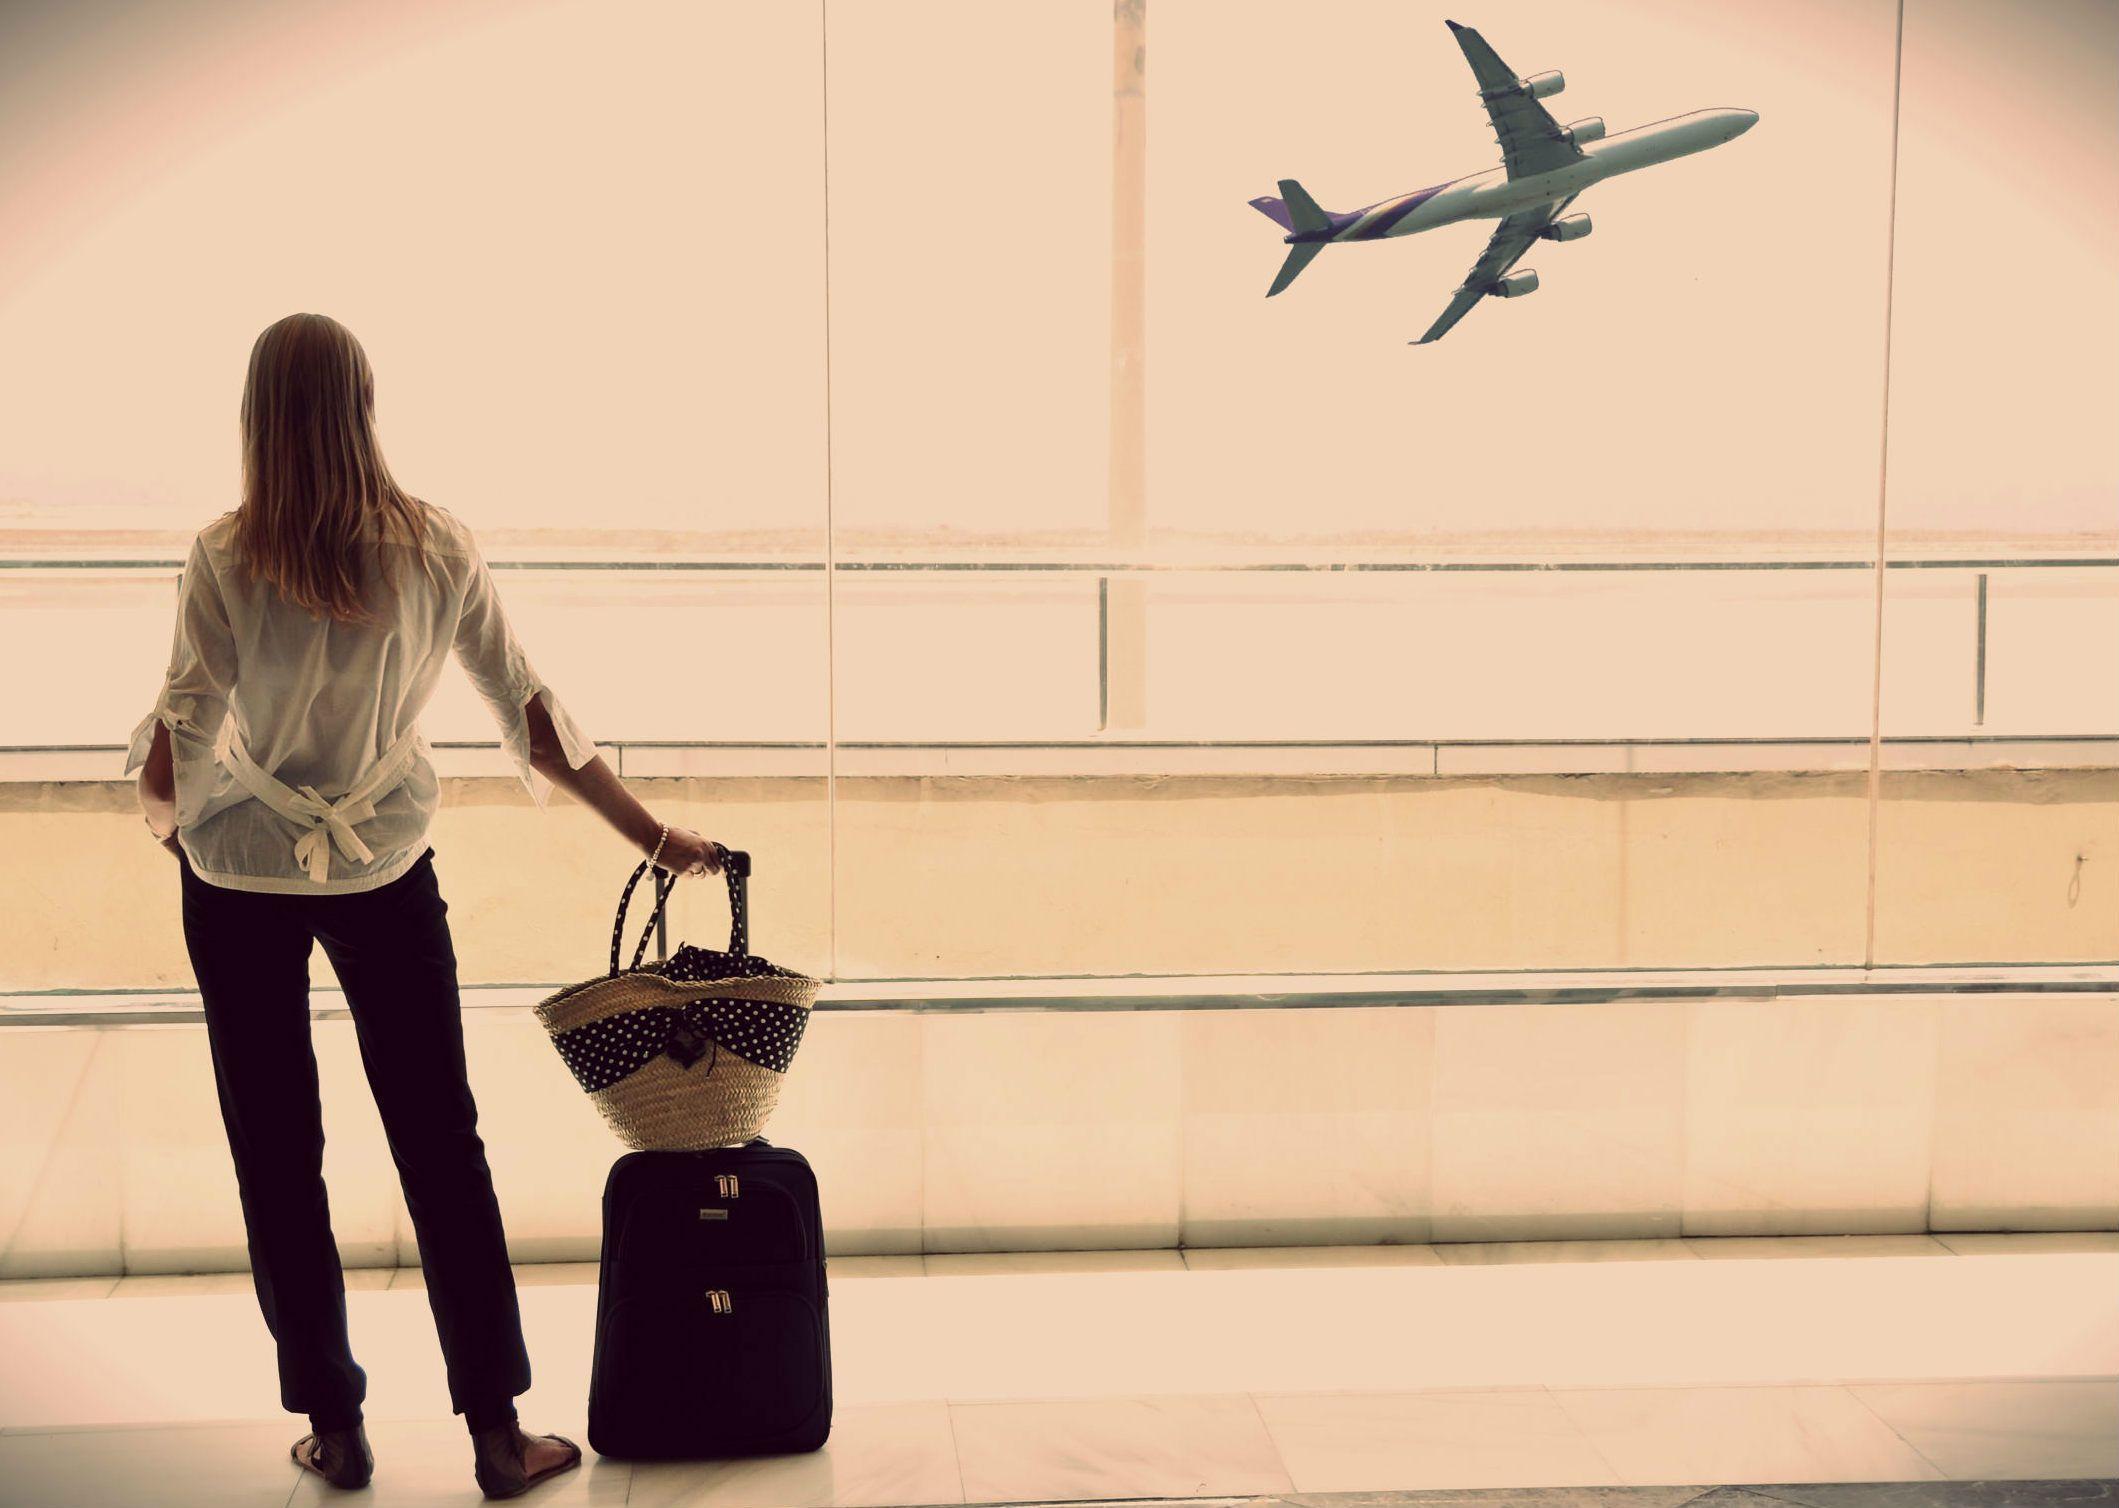 Persona Viajando_filtro